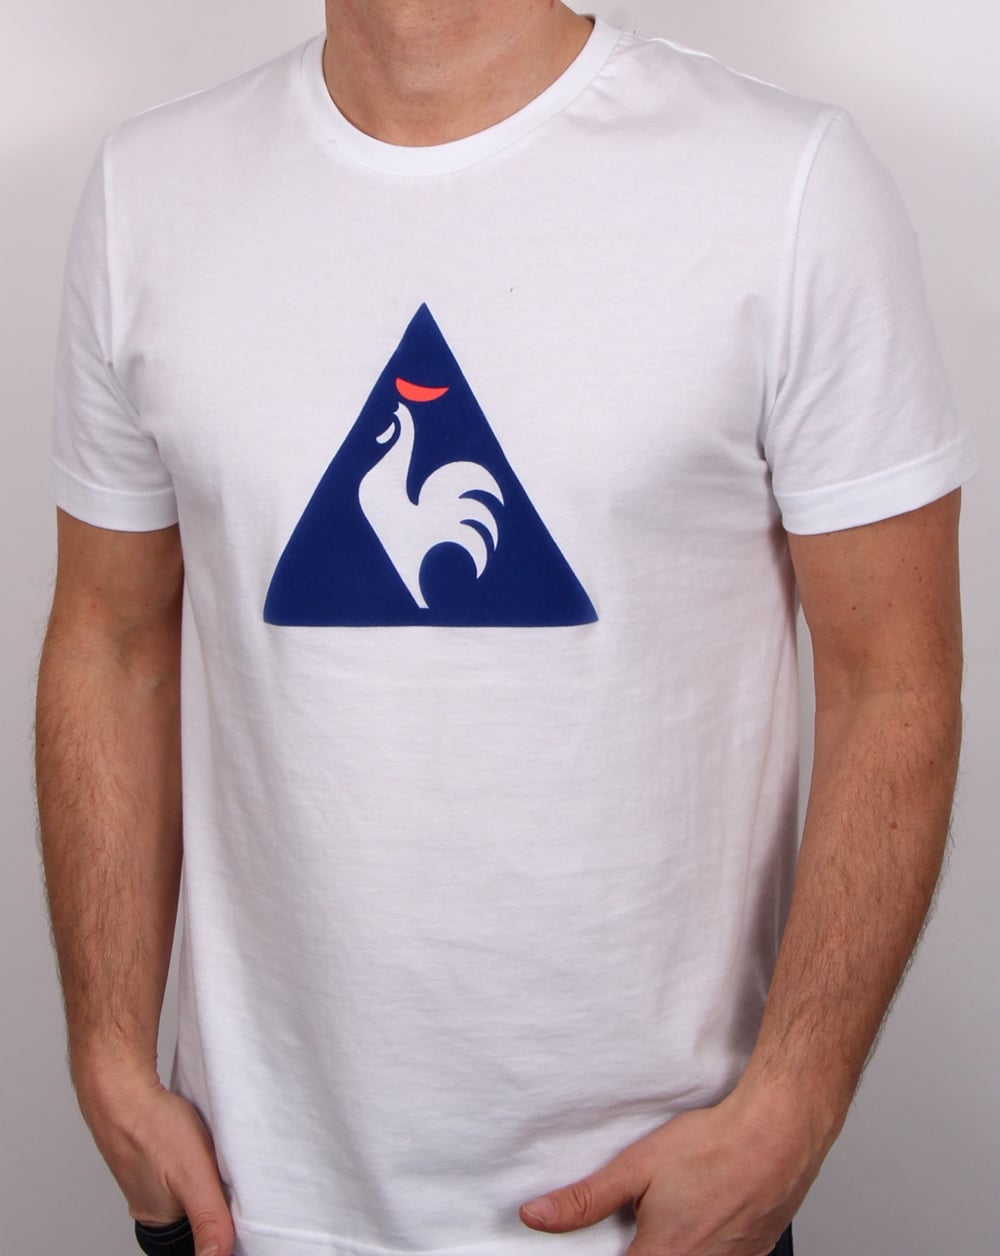 le coq sportif shirt - photo #34